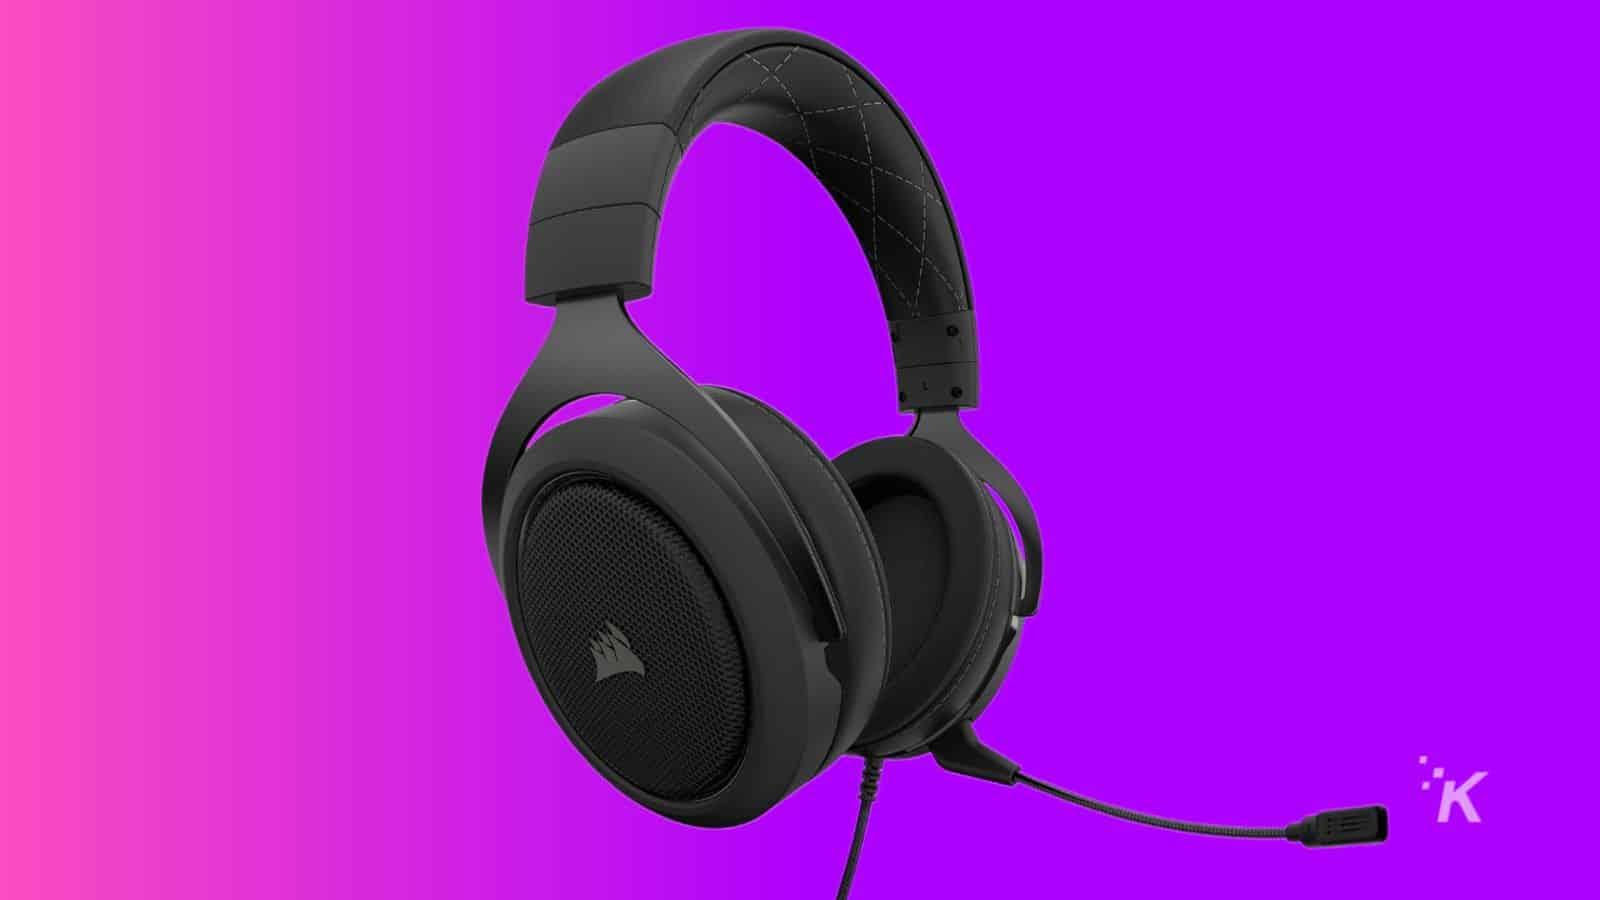 corsair hs600 gaming headset